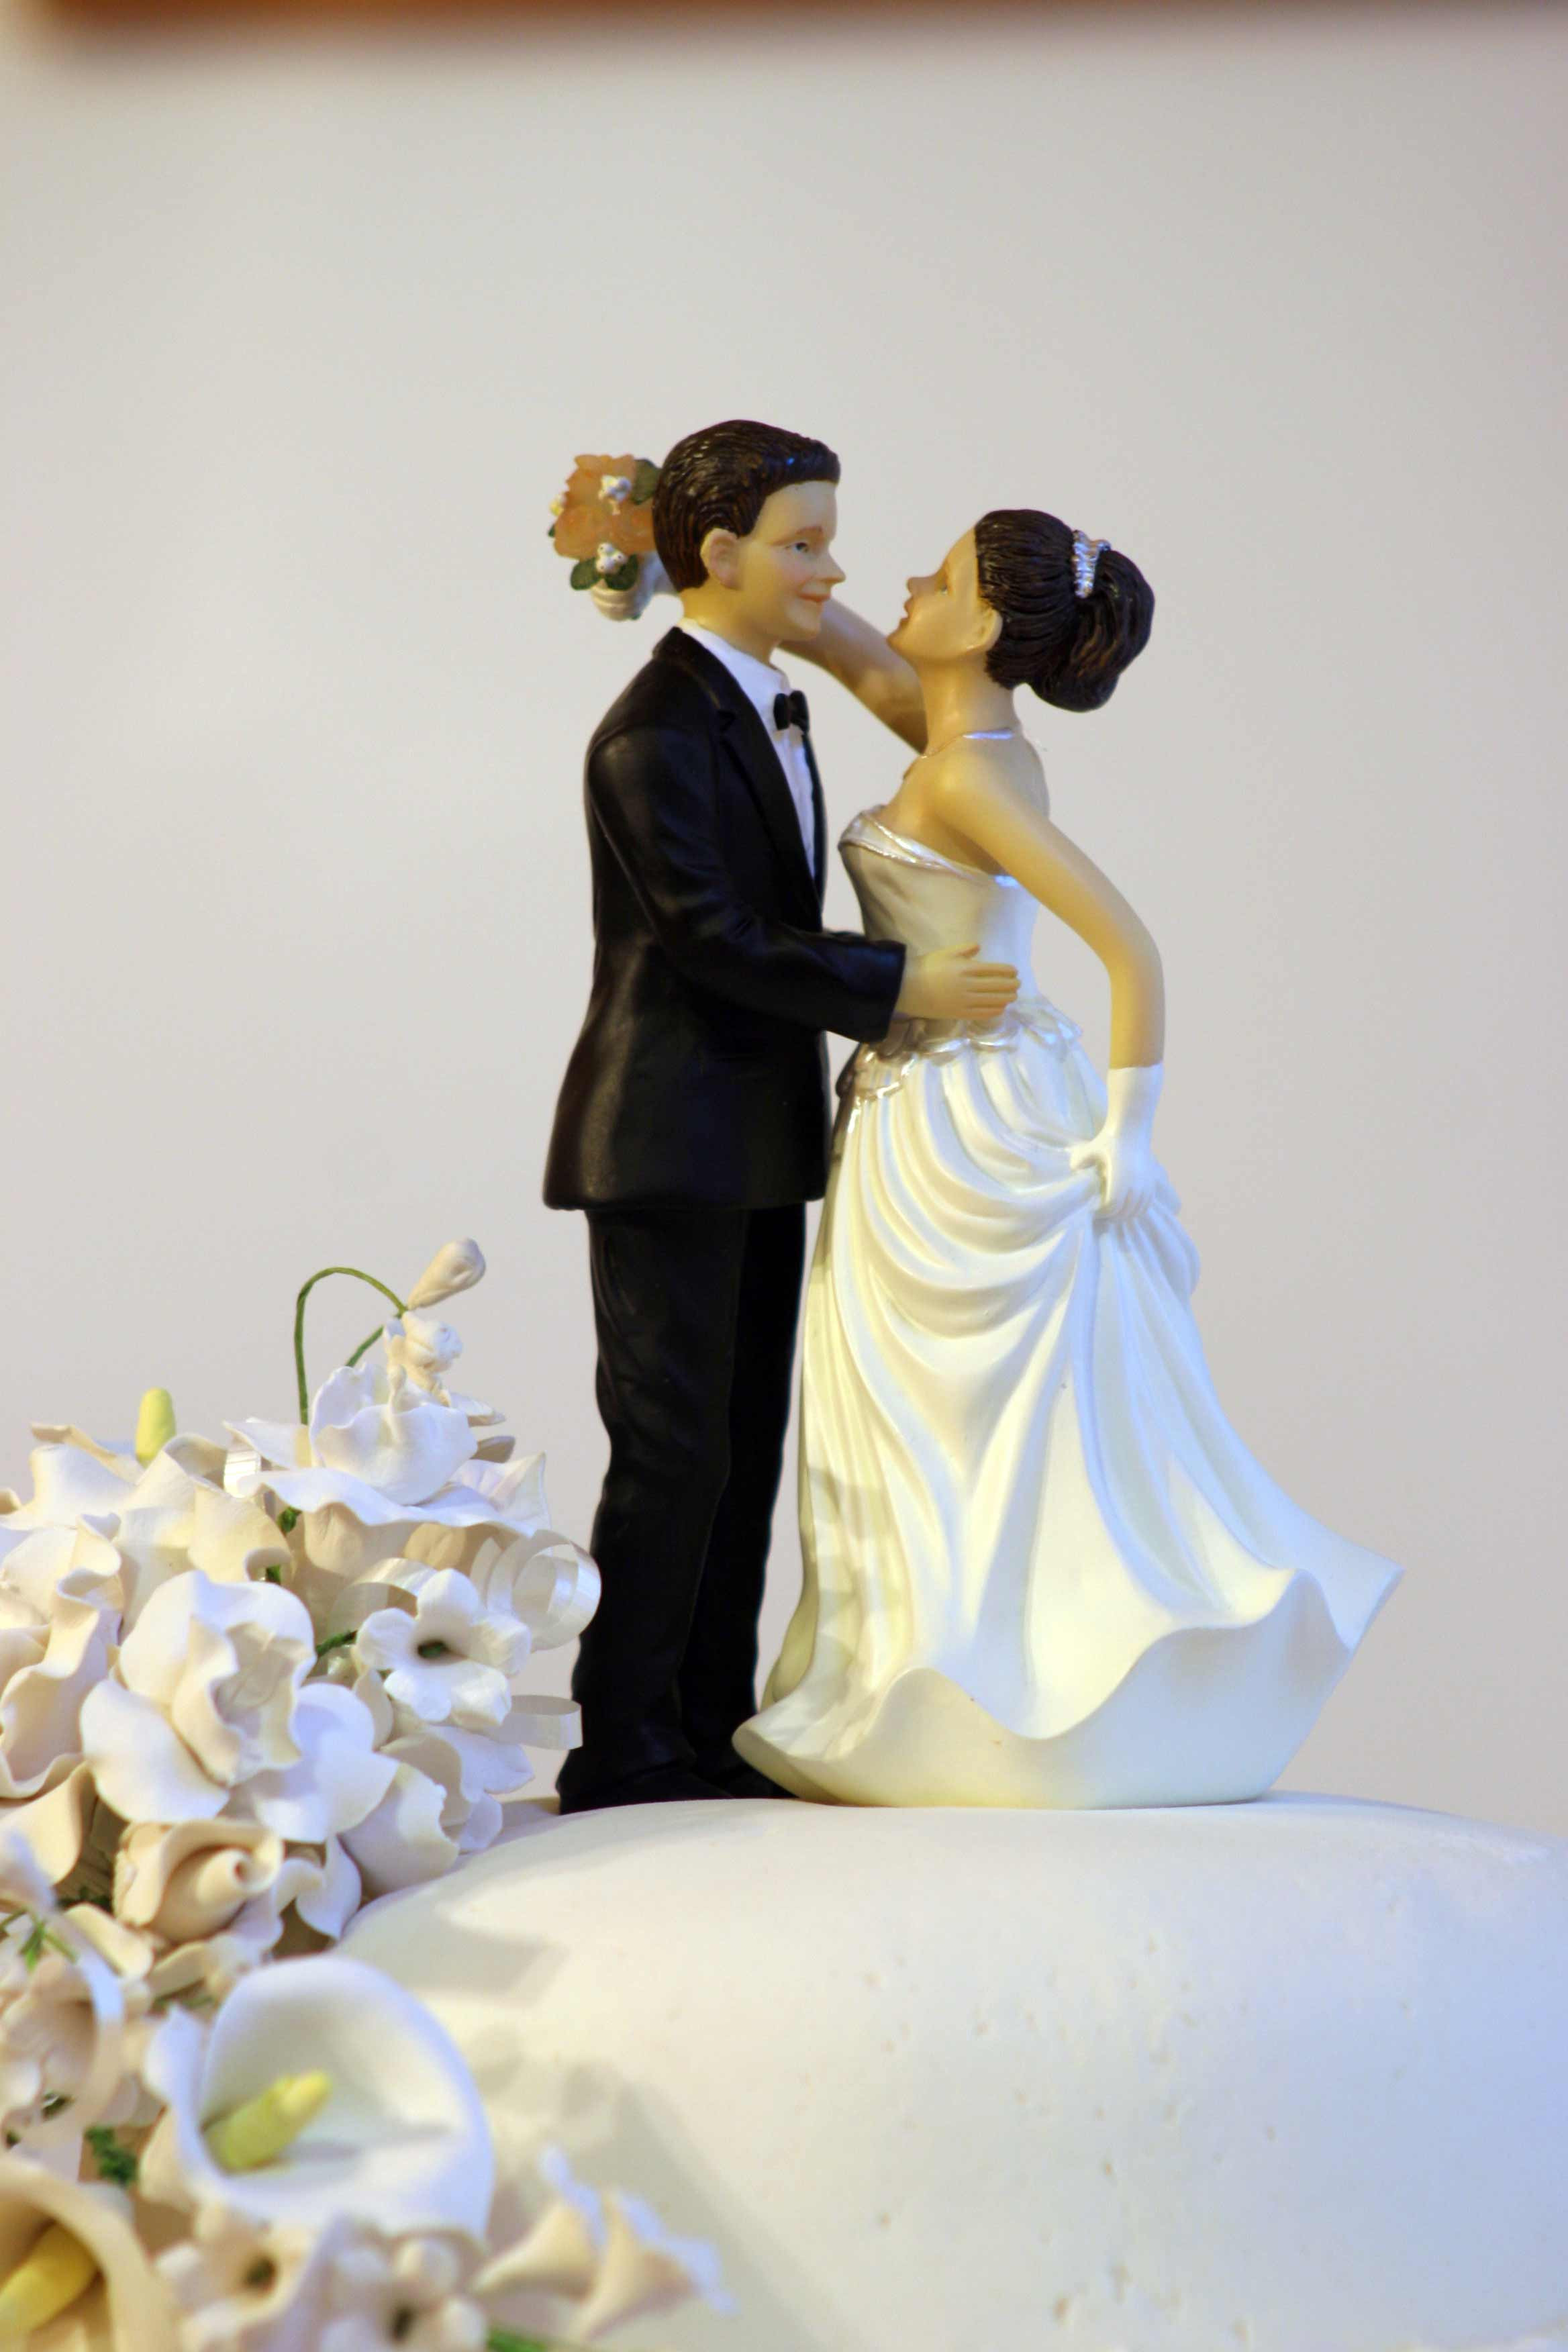 Hochzeitstorte Brautpaar  Hochzeitstorte Brautpaar Marzipan Bildergalerie